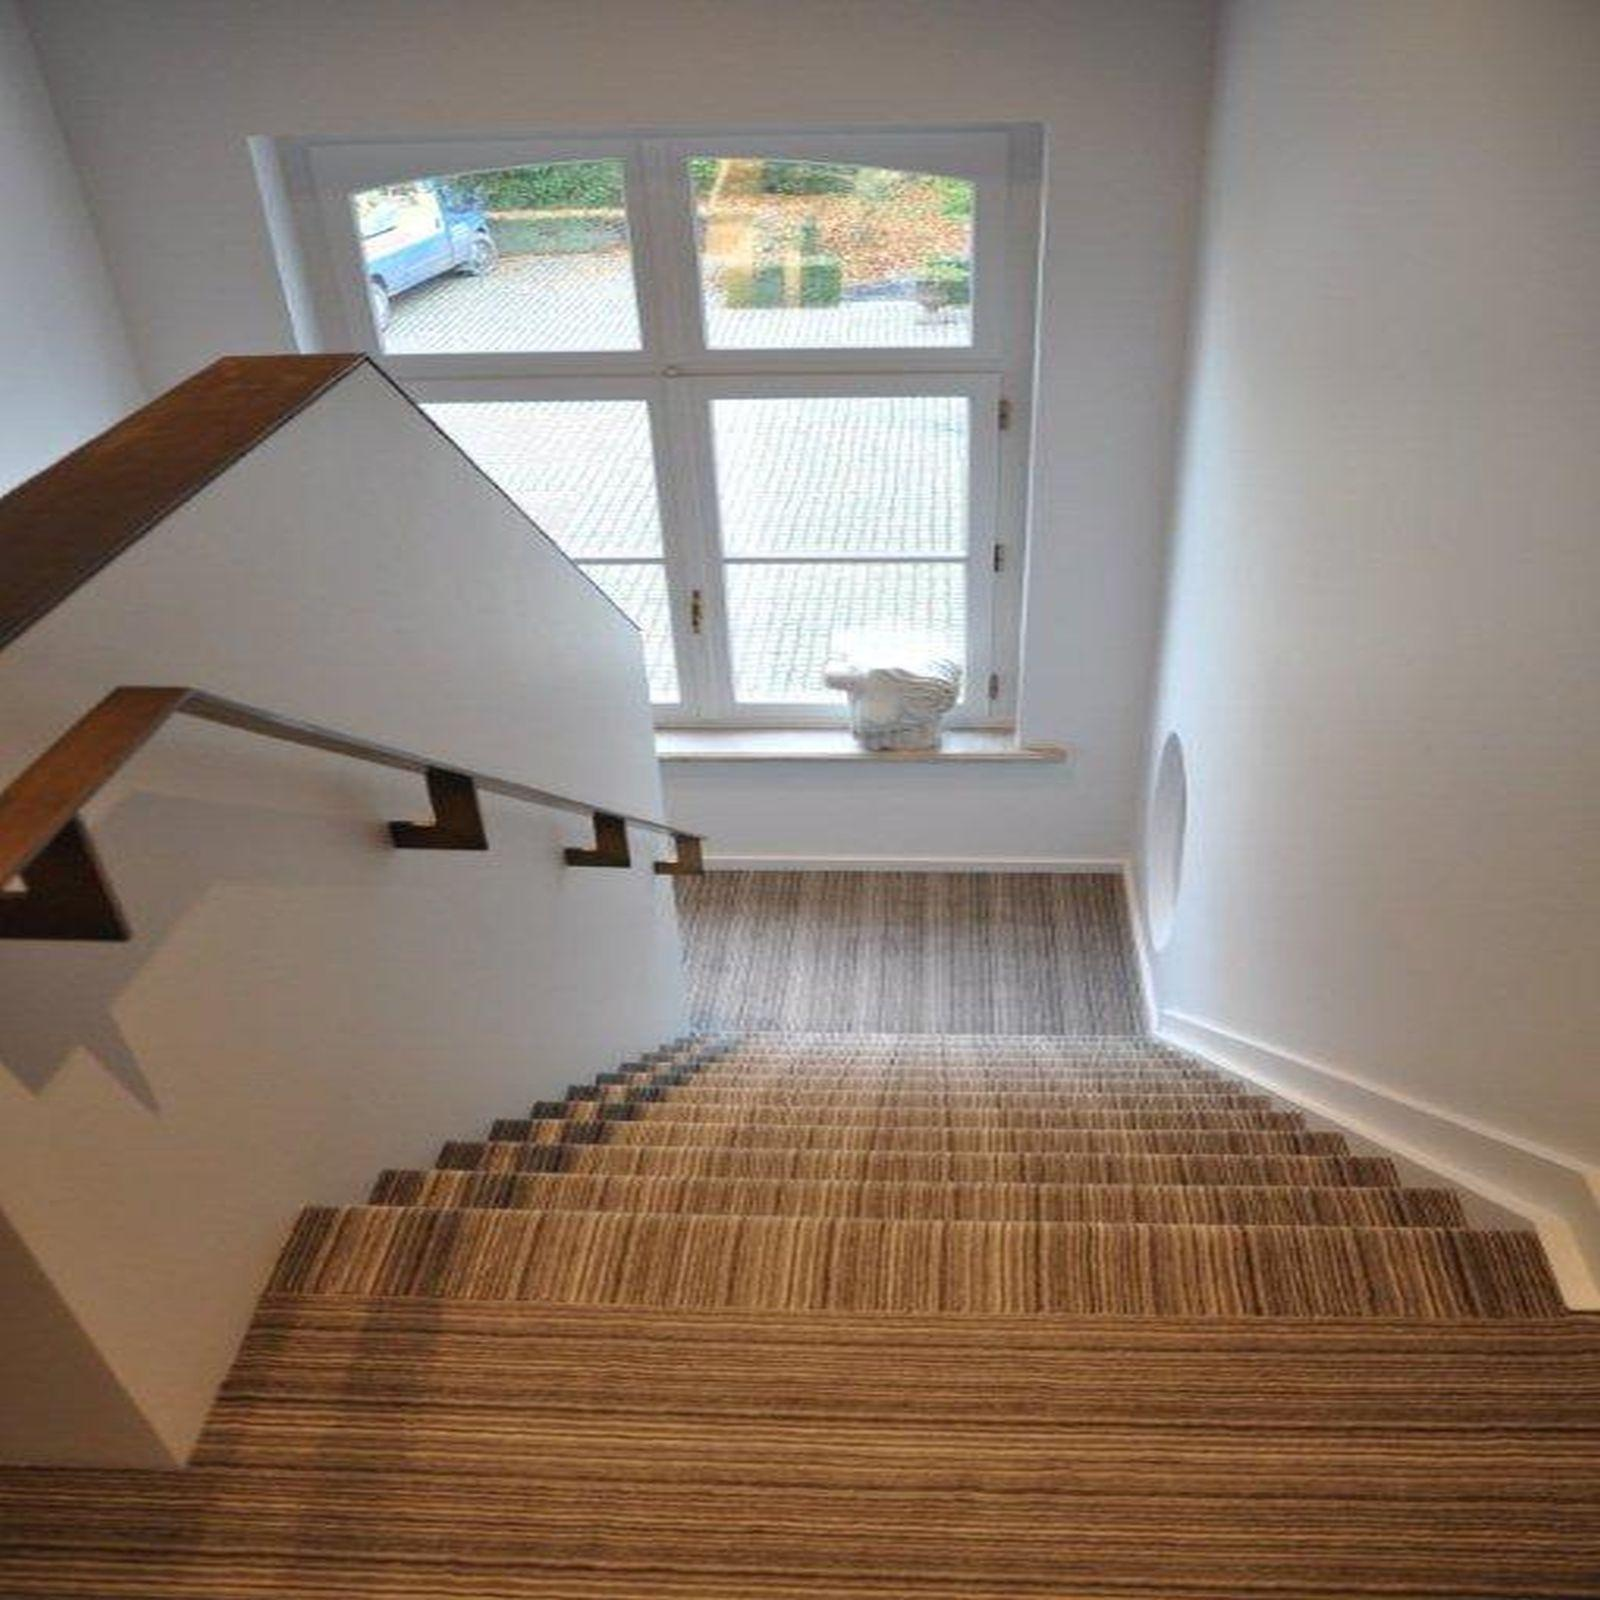 #interieurarchitect #binnenhuisarchitect #renovatie #interieurdesign